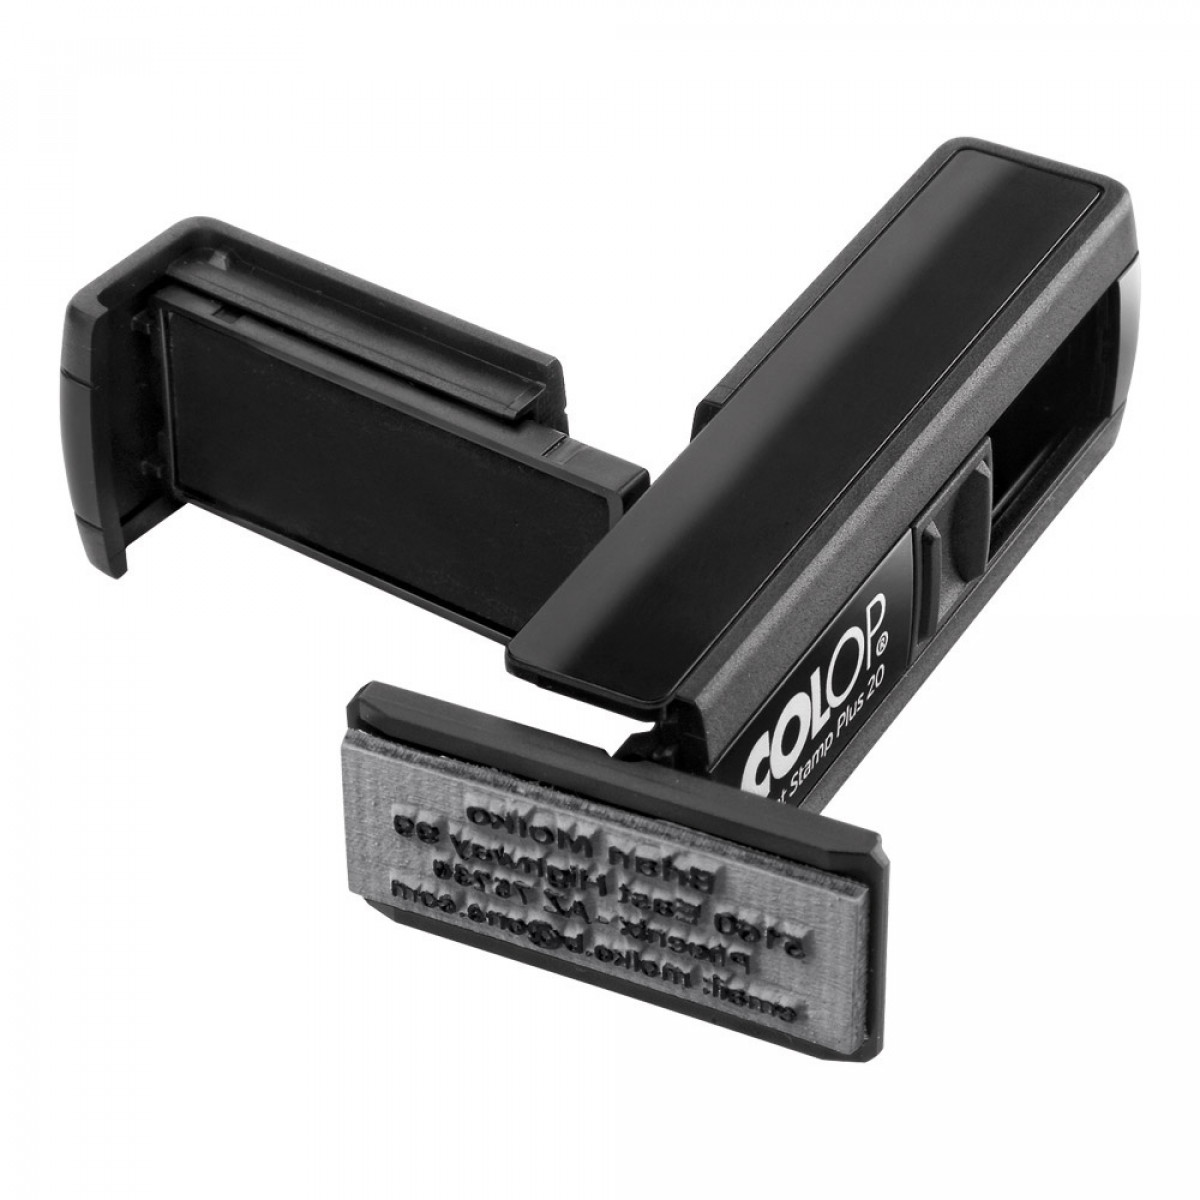 POCKET STAMP PLUS 20 - 14 x 38 mm